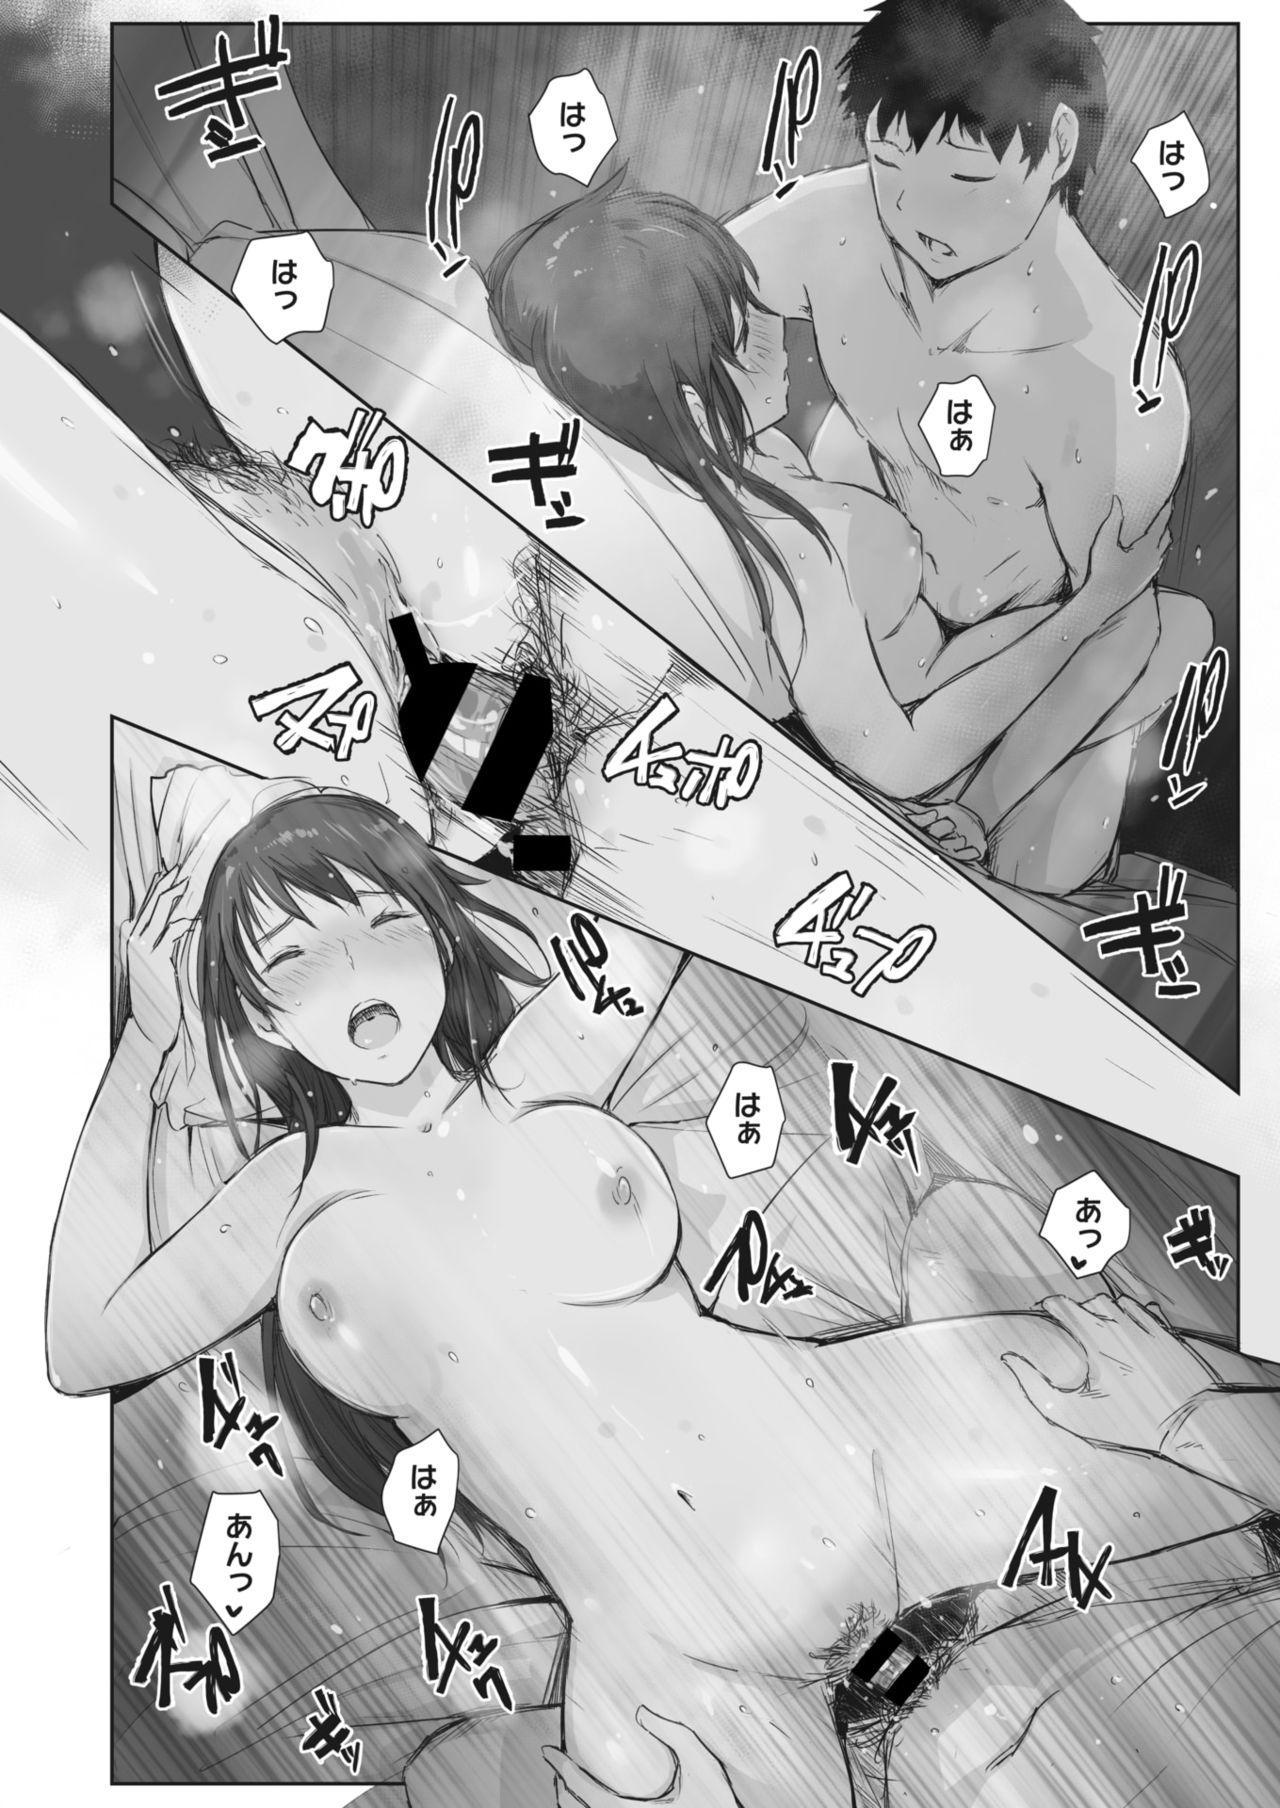 COMIC HOTMiLK Koime Vol. 21 28